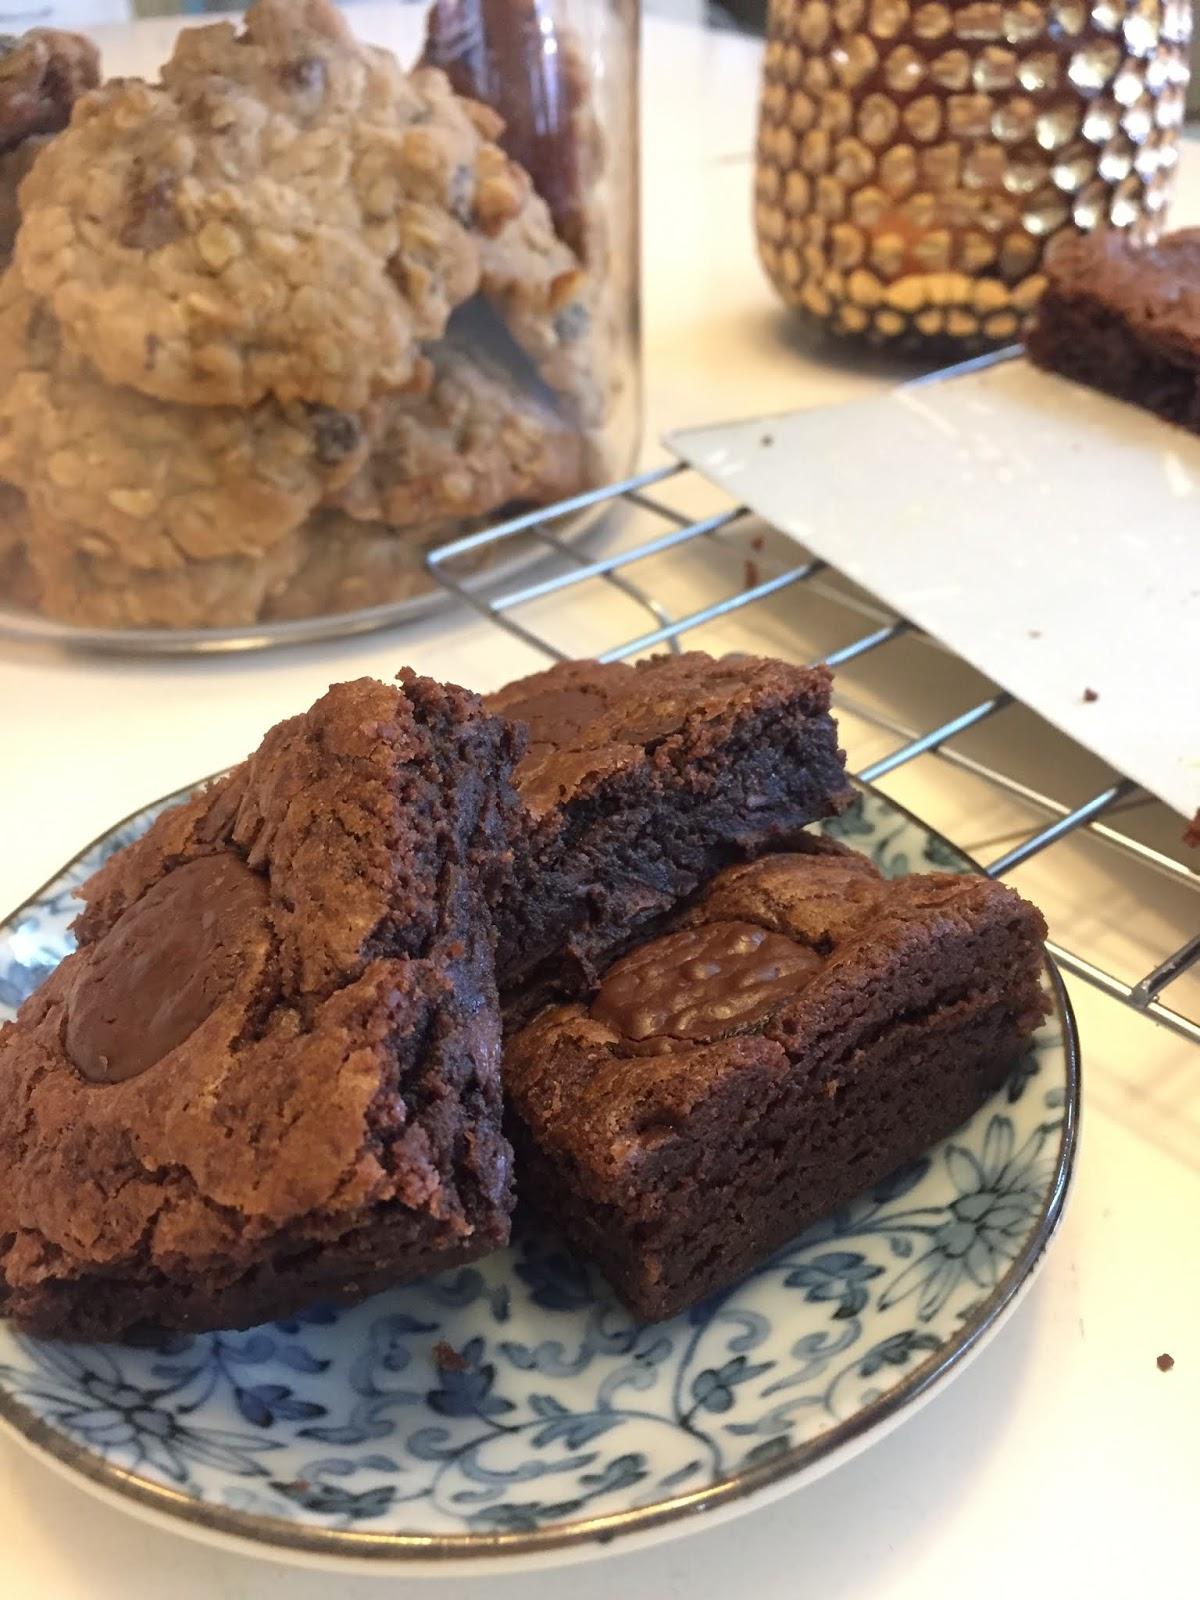 Chocolate Congo Bar, Resepi Senang, Mudah Dan Sedap